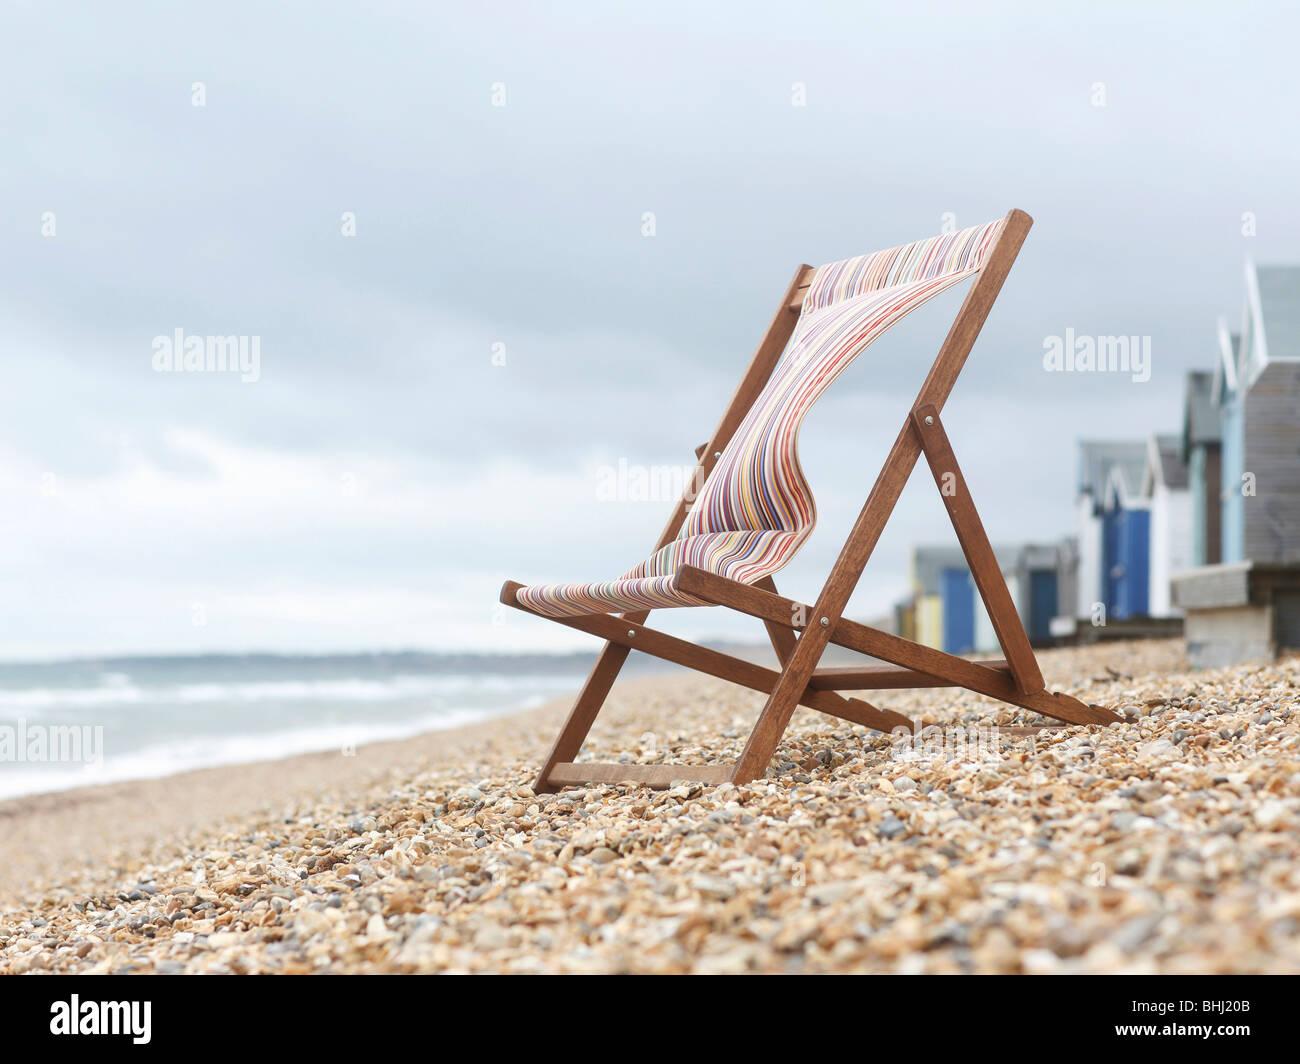 deck chair stockfotos deck chair bilder alamy. Black Bedroom Furniture Sets. Home Design Ideas